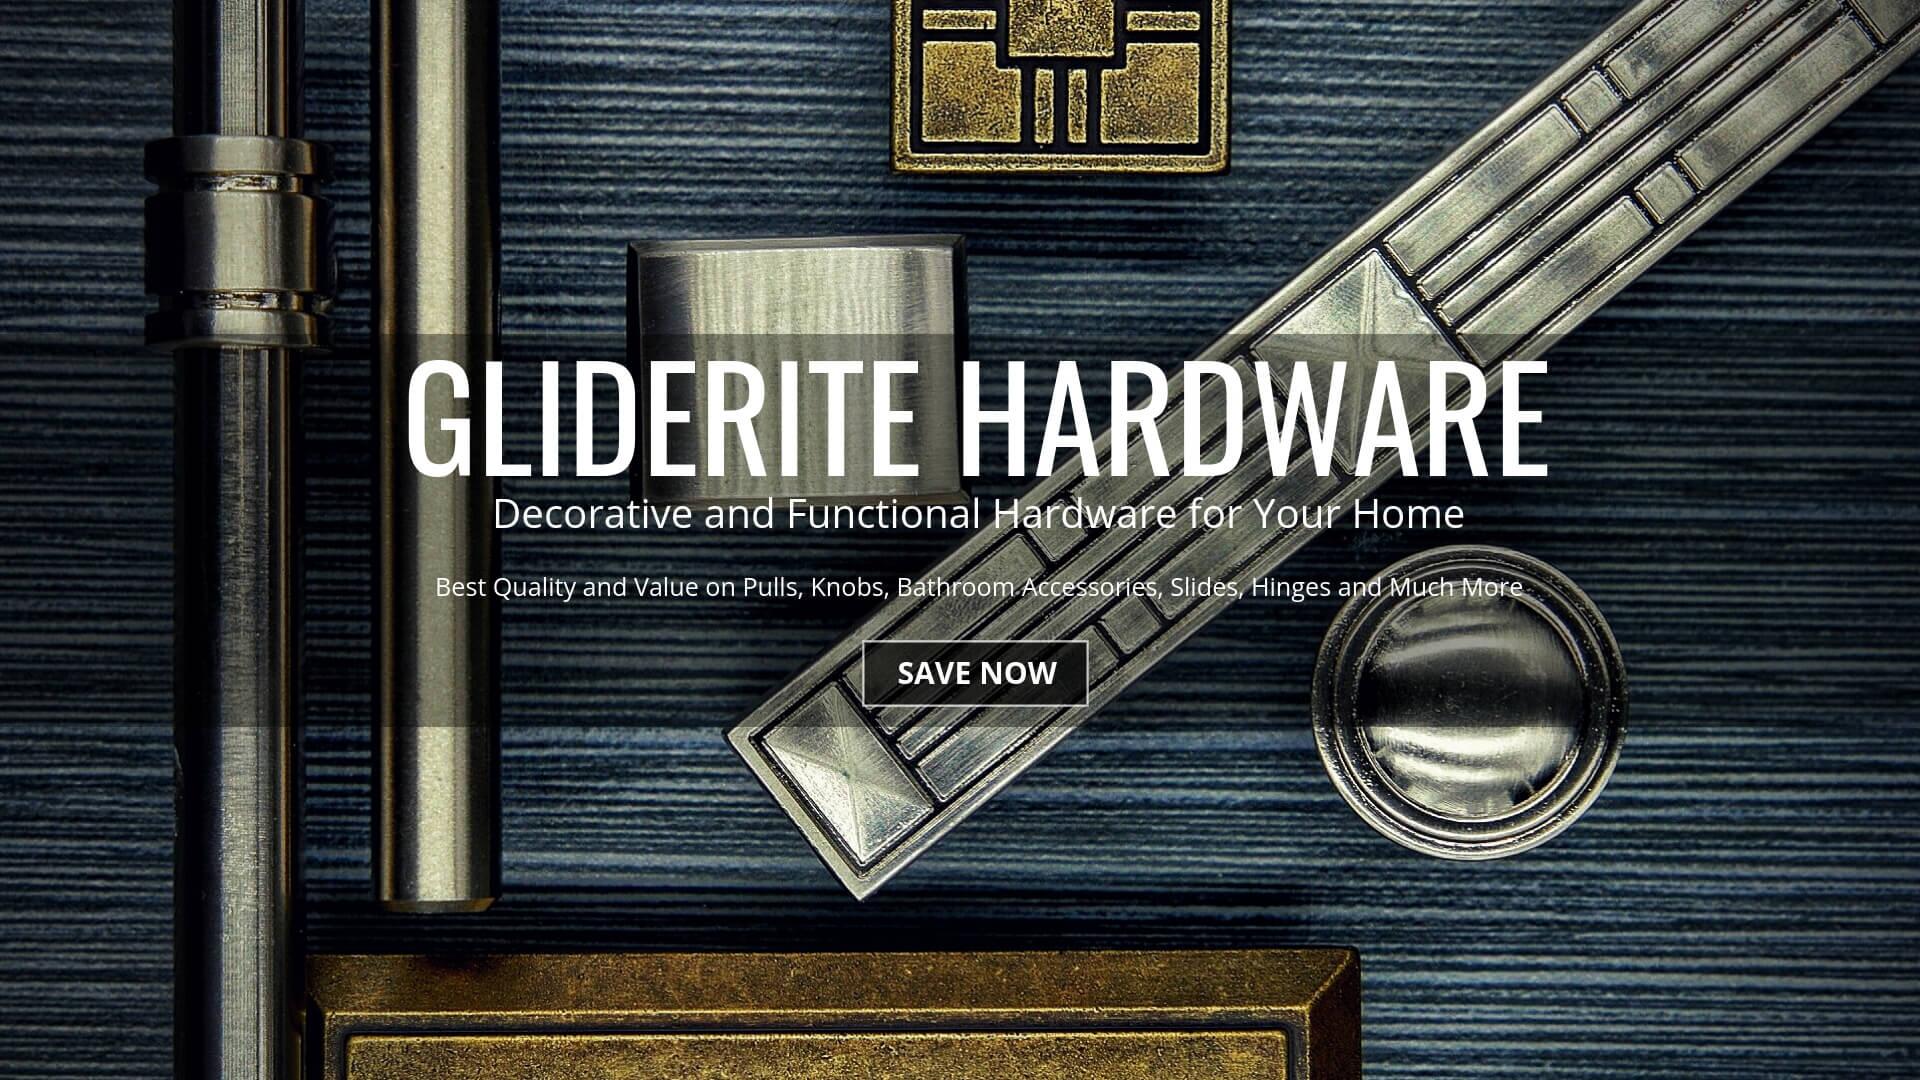 GlideRite Hardware Decorative Pulls and Knobs